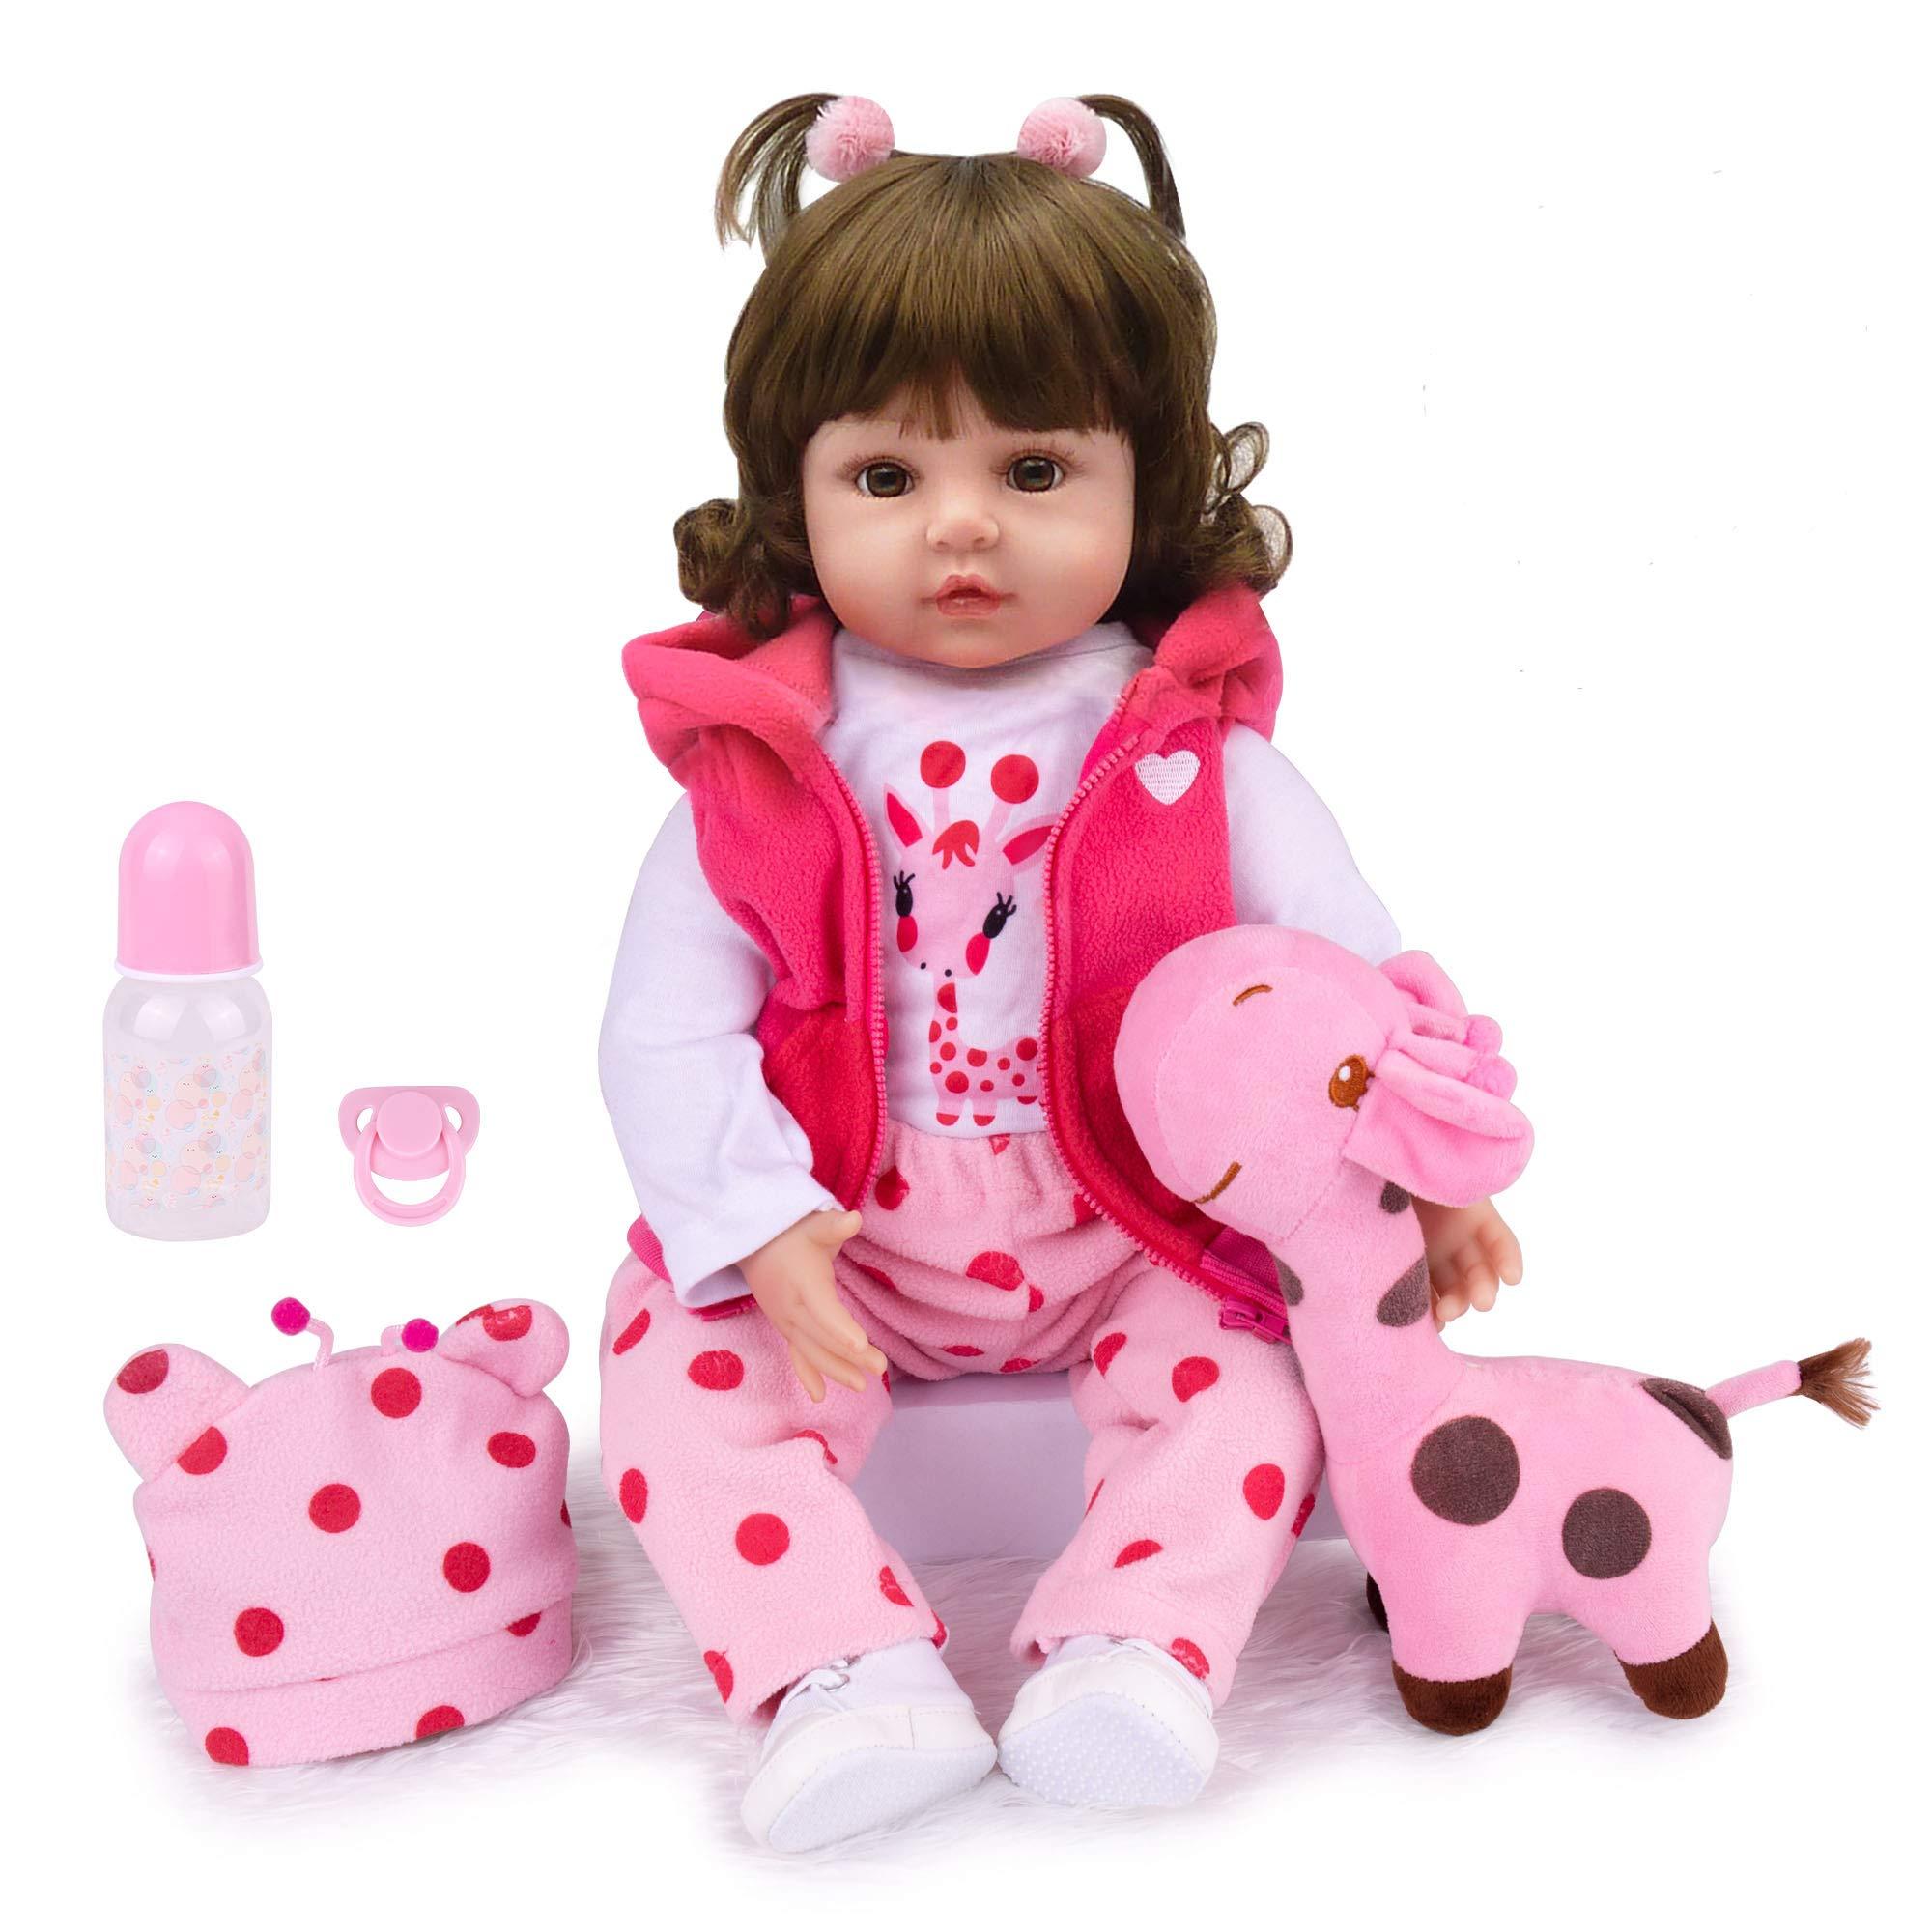 Named Abby Kaydora Reborn Baby Doll 22 Inch Adorable Toddler Girl Reborn Baby